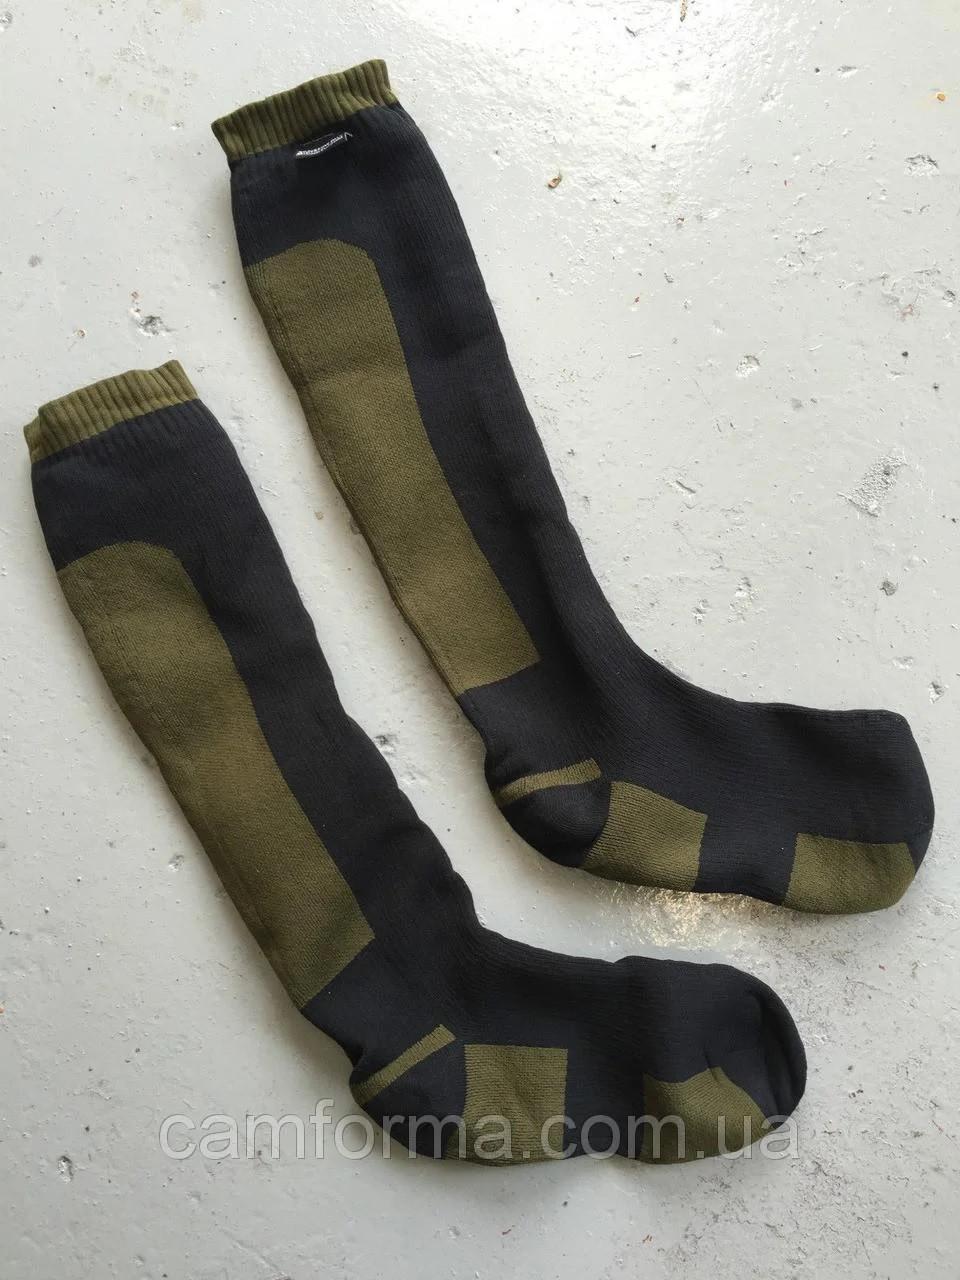 Носки водонепроницаемые Sealskinz Military Issue армии Британии Б/У 1сорт